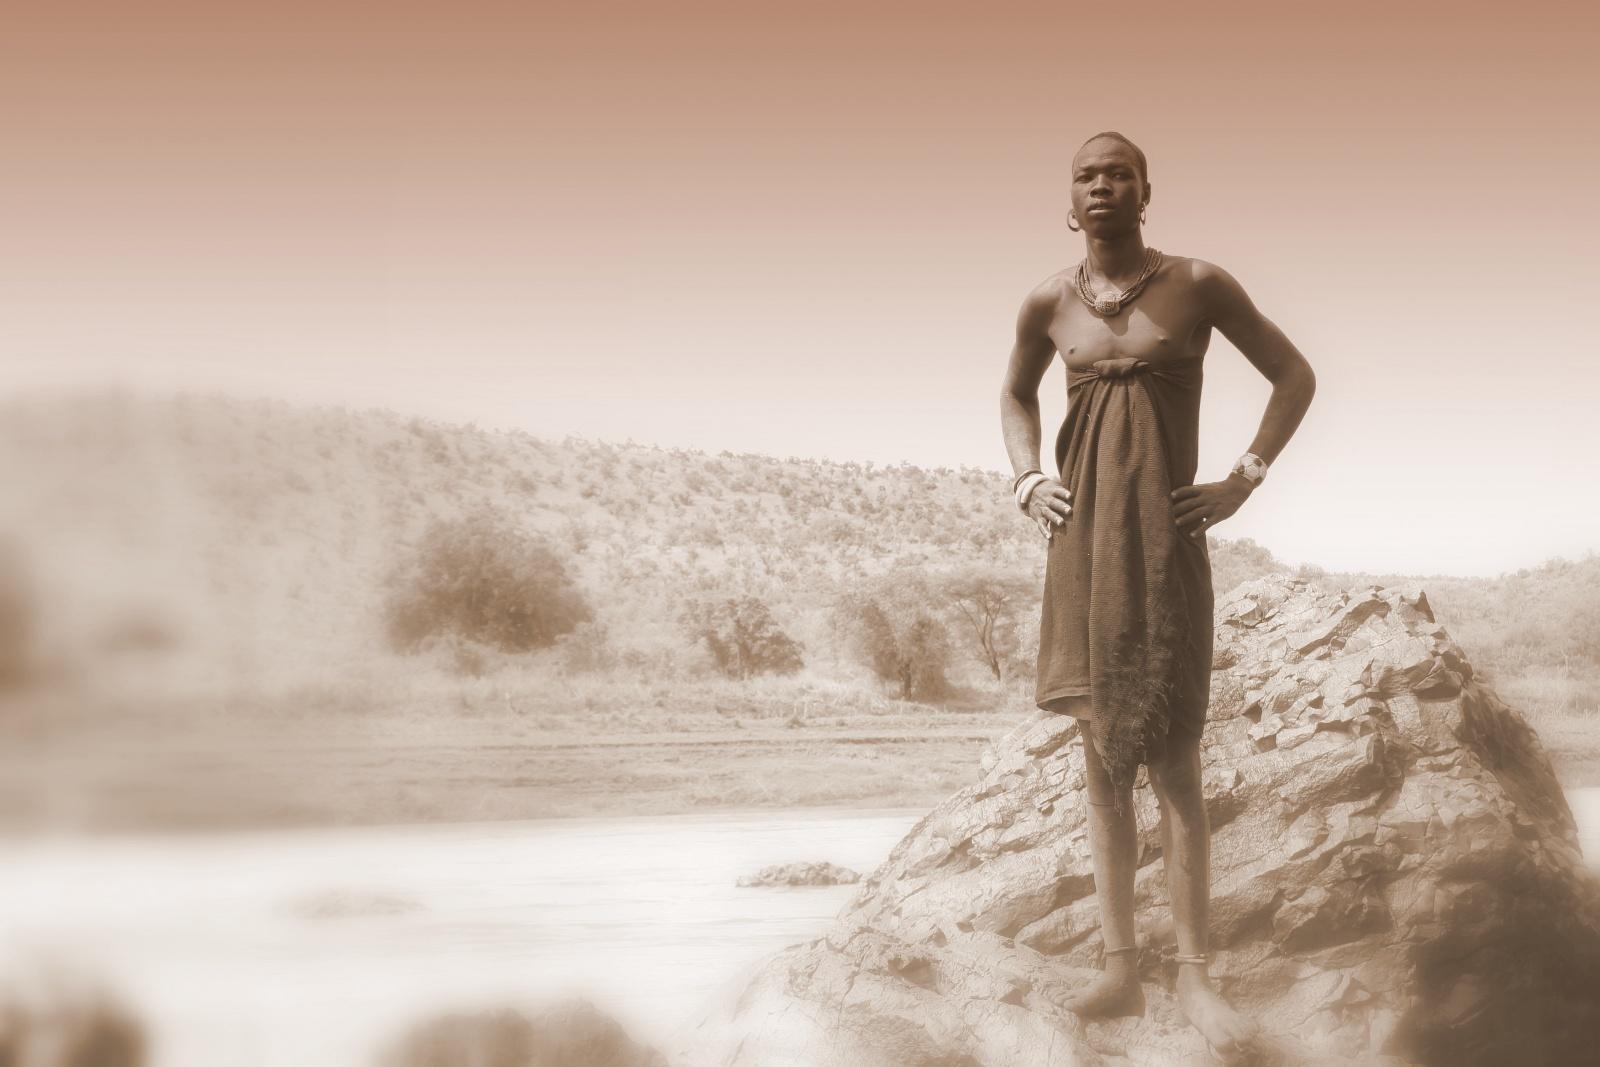 Click image for larger version  Name:Africa man for desktop.jpg Views:118 Size:330.3 KB ID:1850